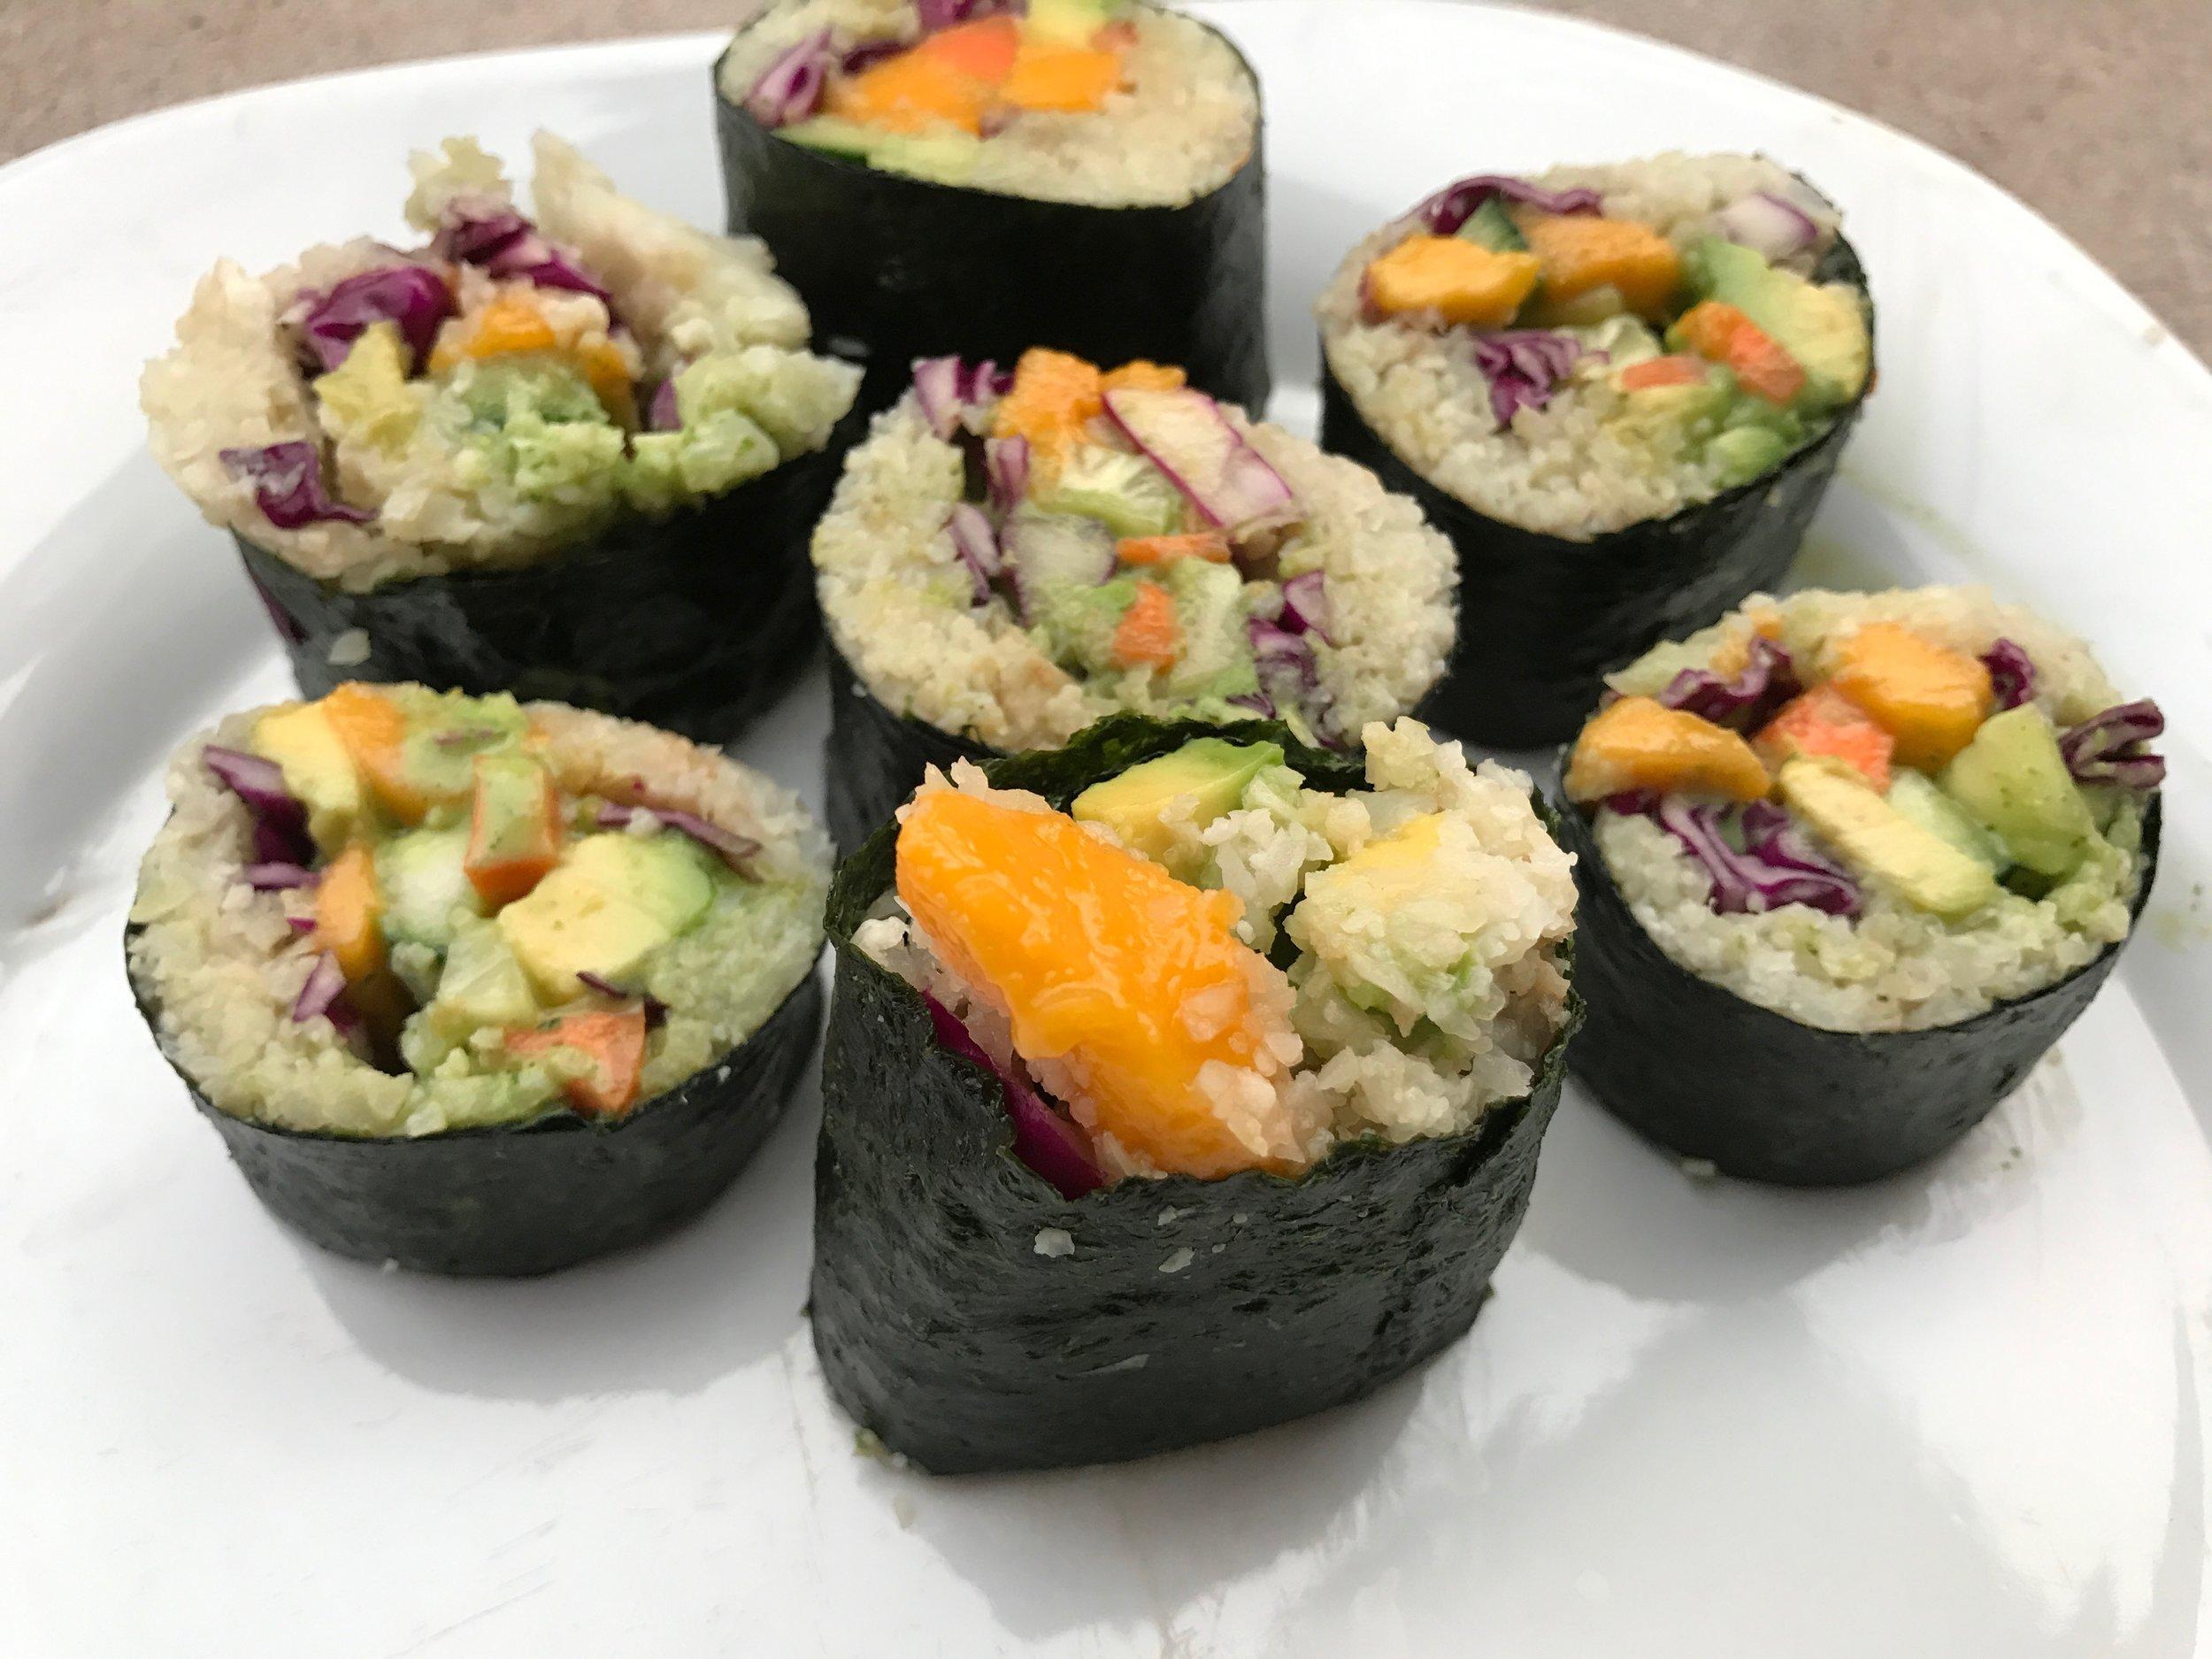 Ingredients: mango, purple cabbage, cauliflower rice, avocado, cucumber, carrot and  Myra Lesser 's green sauce